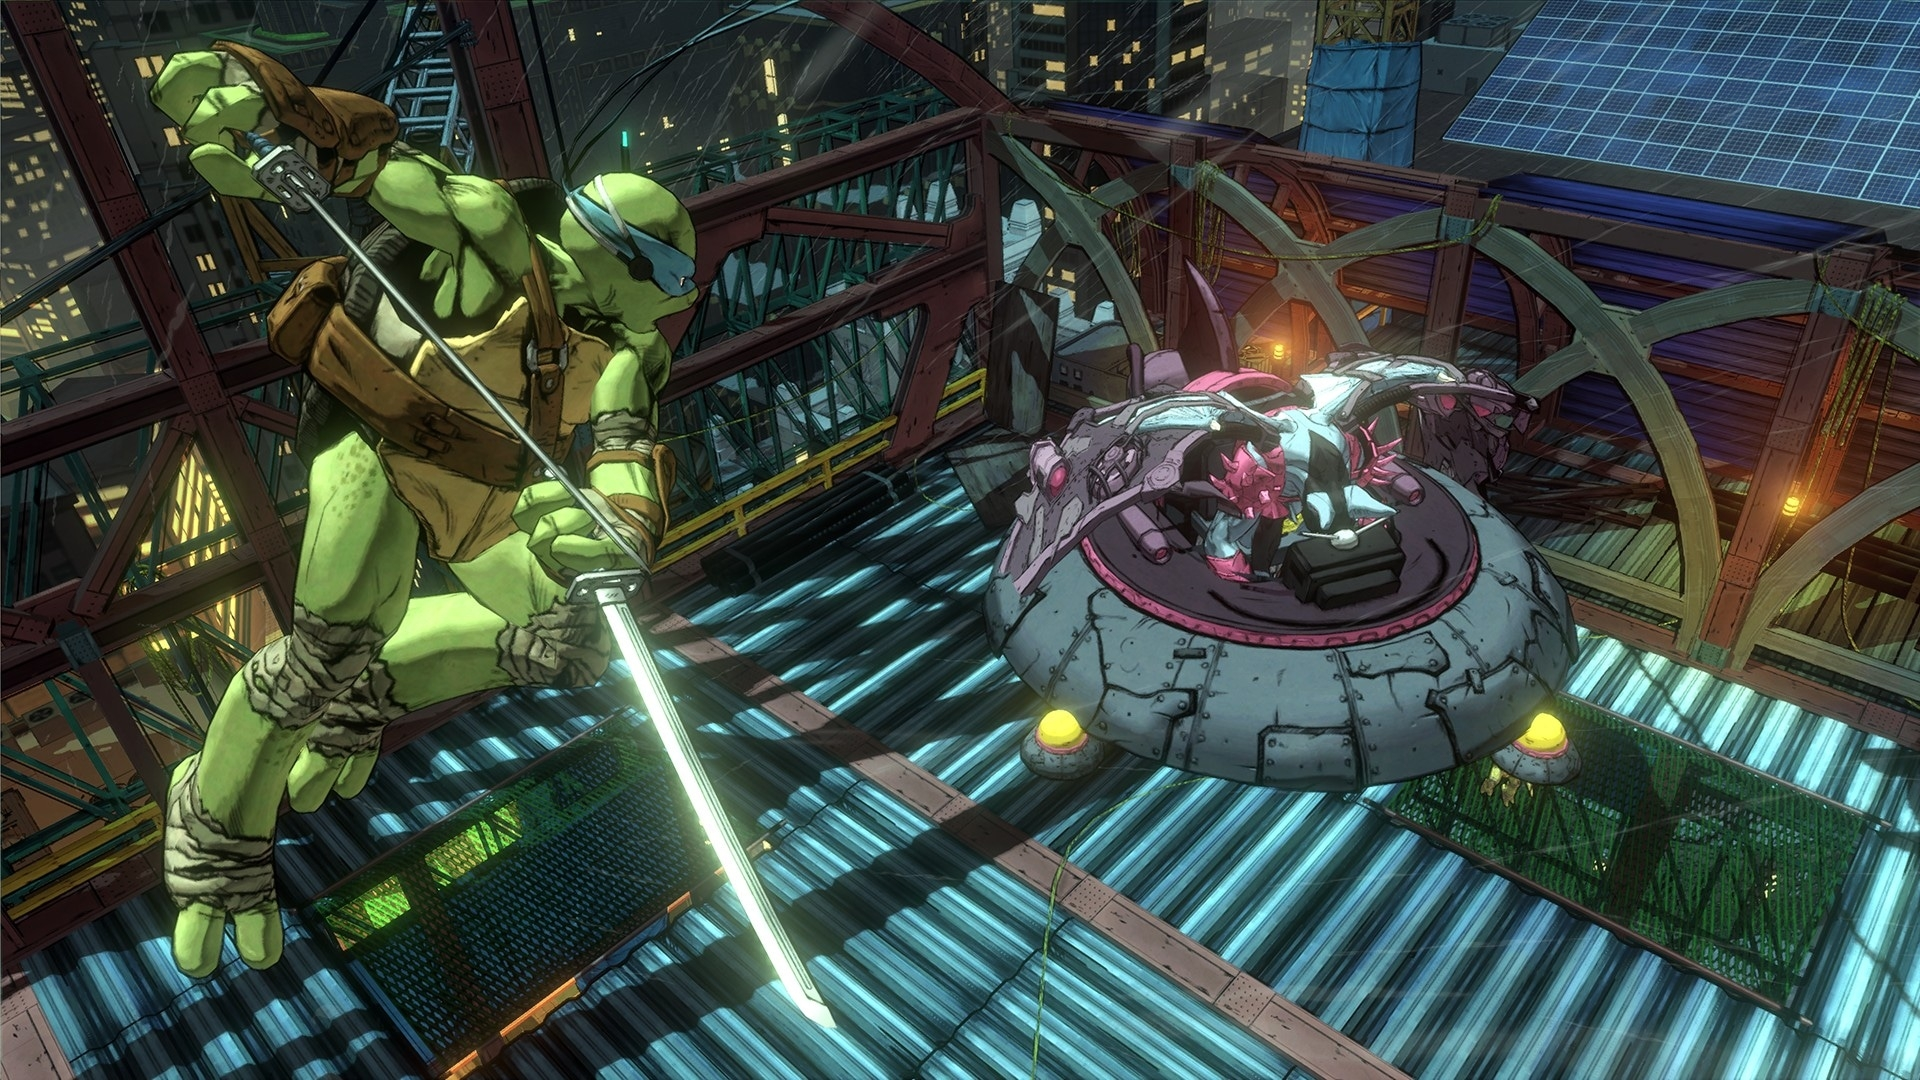 media-screenshot-008-fullsaTeenage Mutant Ninja Turtles: Mutants in Manhattanize